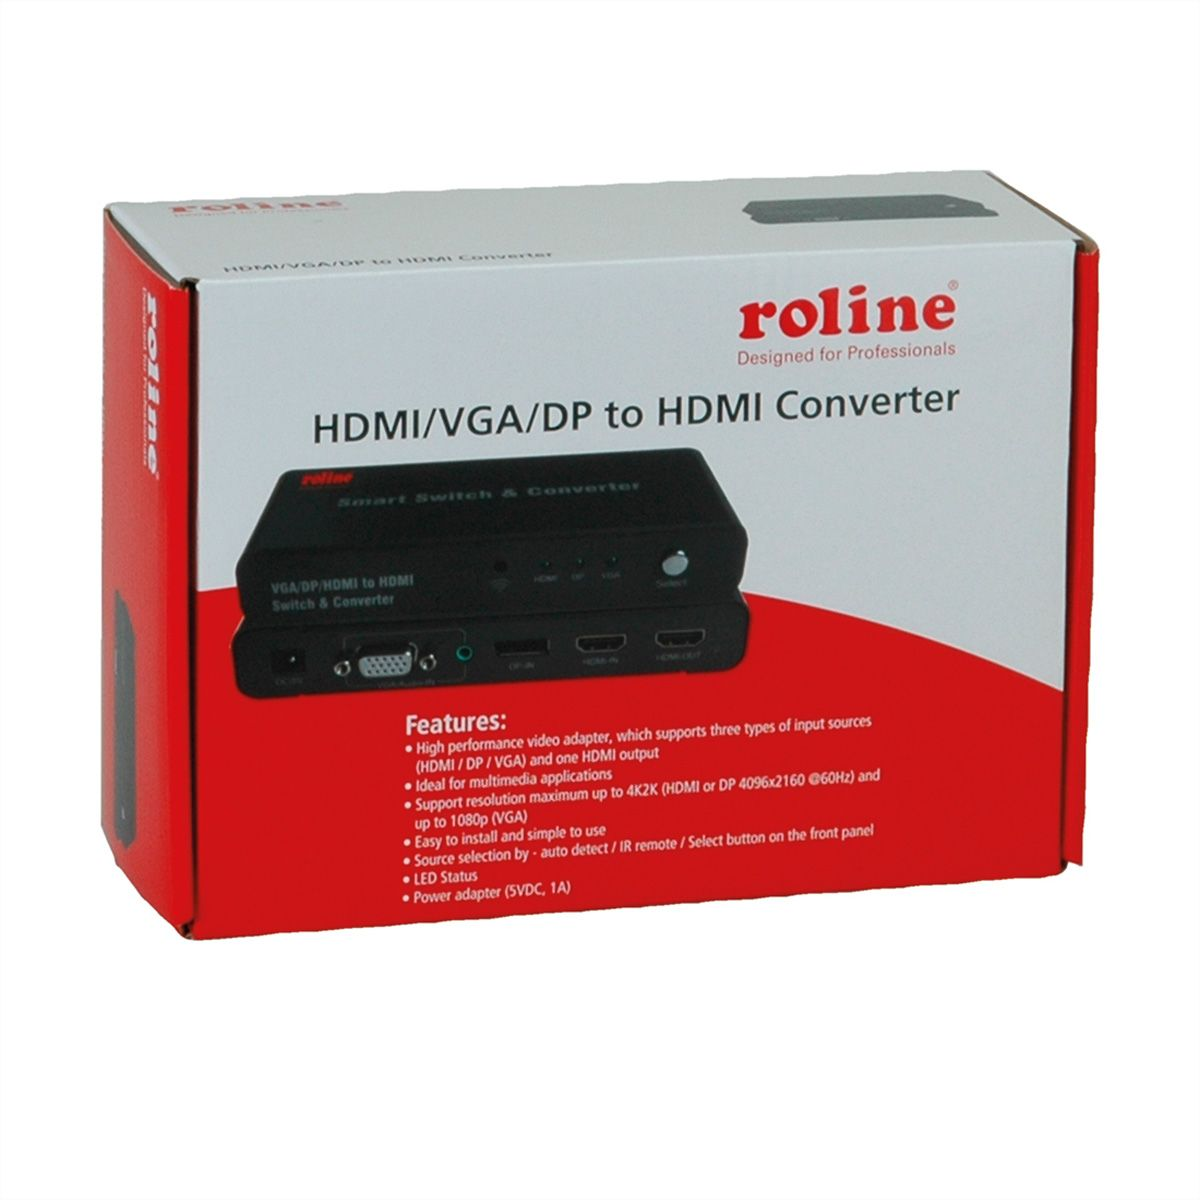 ROLINE HDMI/VGA/DP to HDMI Converter - SECOMP International